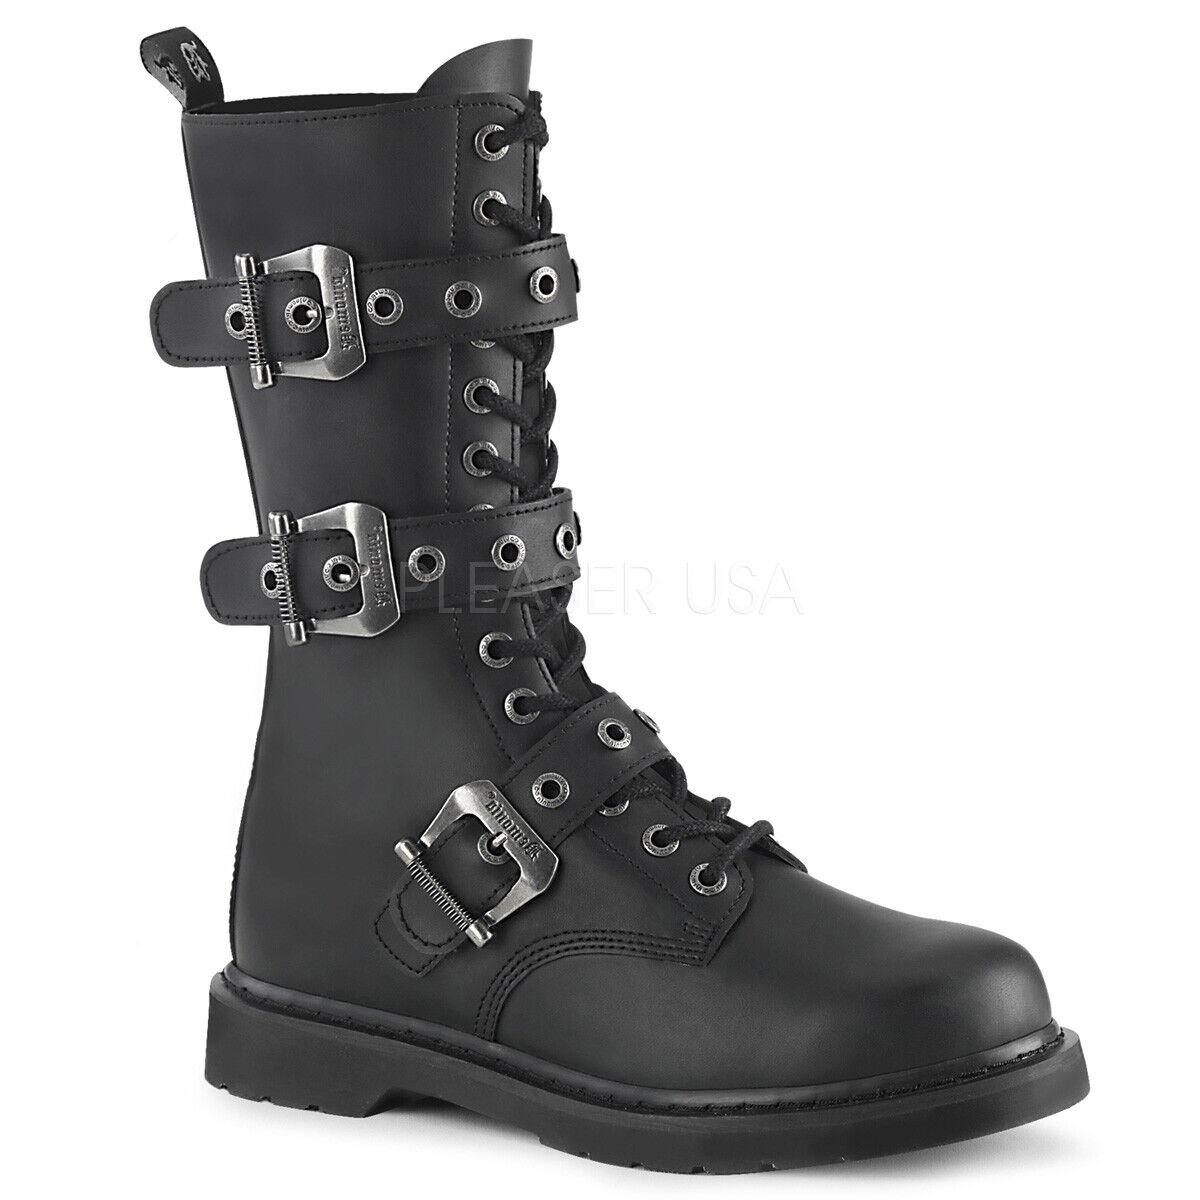 DEMONIA Mens Punk Goth Military Biker Combat Lace Up Buckles Black Calf Boots